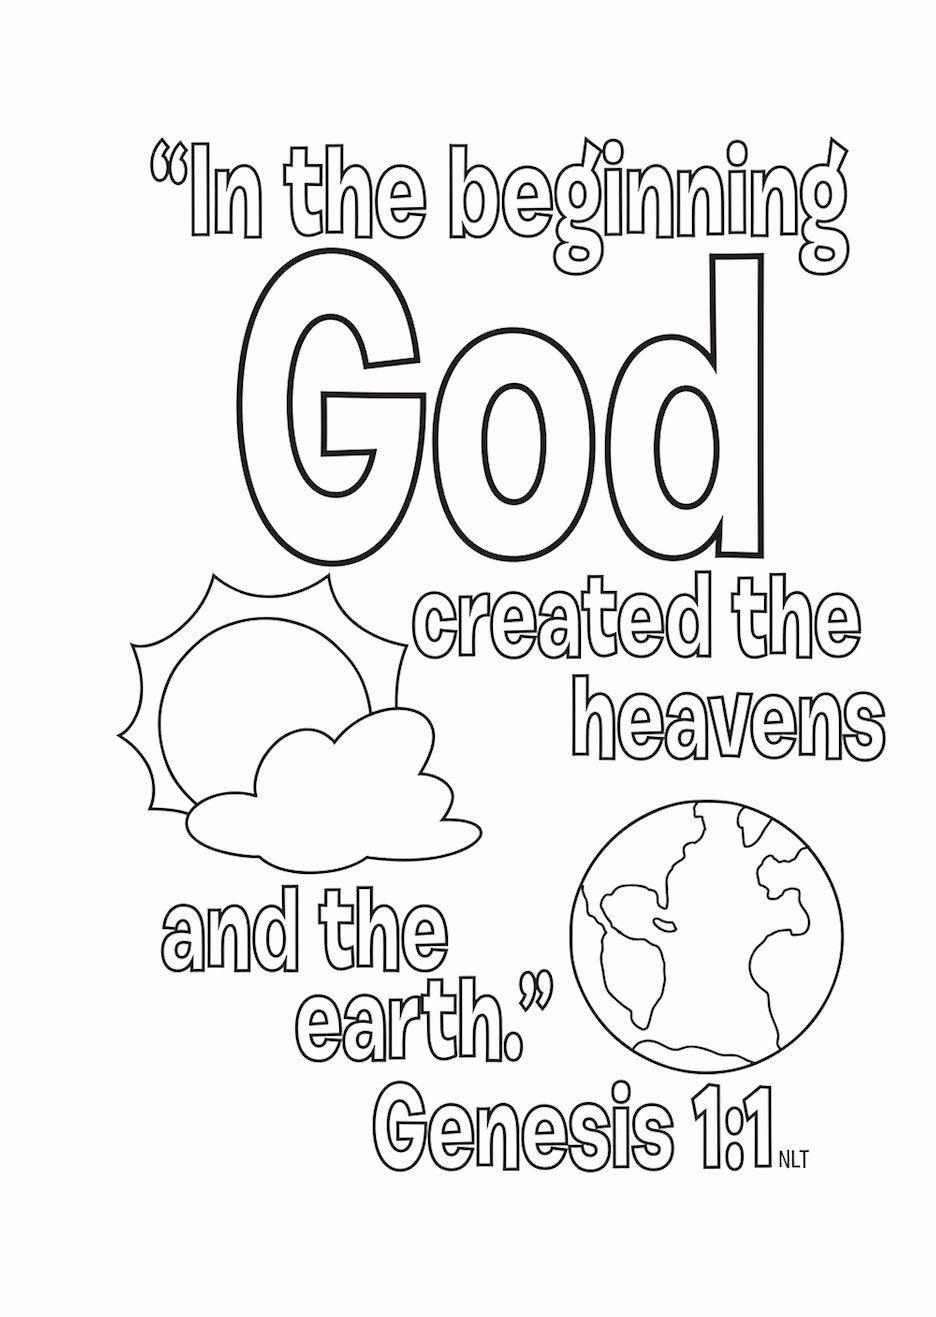 Bible Story Worksheets For Preschoolers Kids Worksheet Free Bible Printablesy For Preschoolers Bible Coloring Pages Coloring Books Bible Coloring